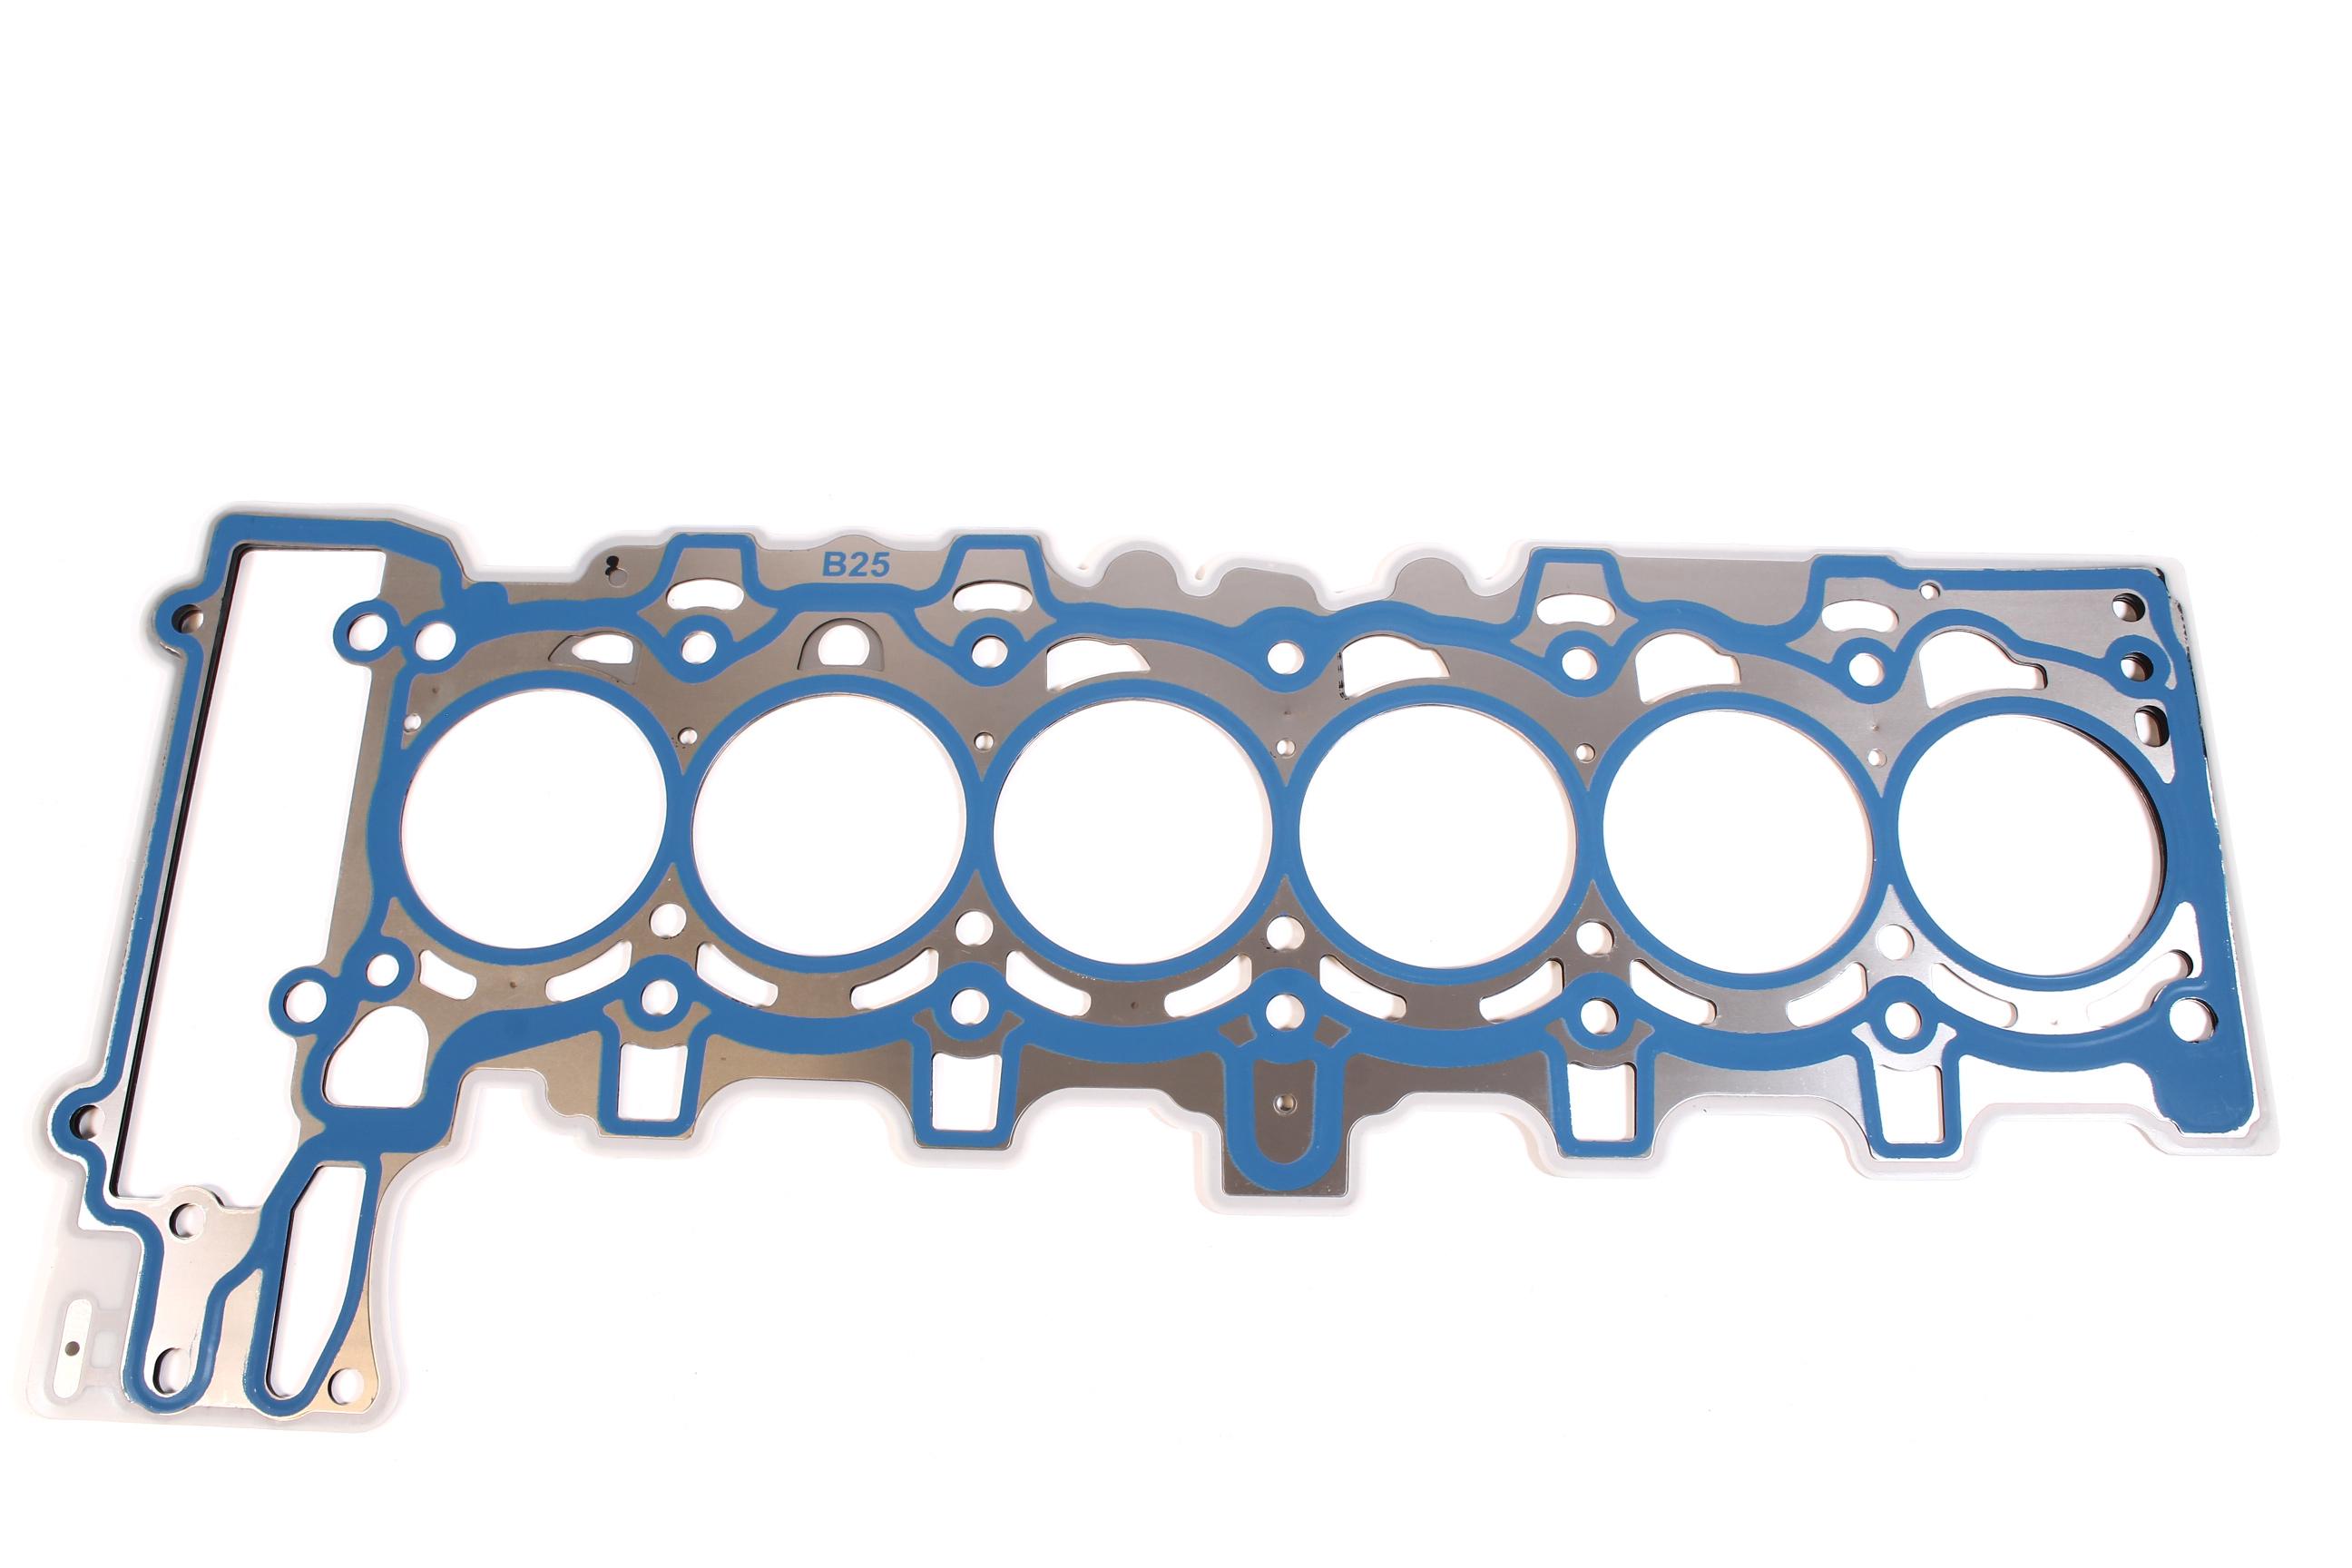 Zylinderkopfdichtung BMW 3er E90 E91 E92 E93 2,5 325 i N52B25A 11127555755 NEU